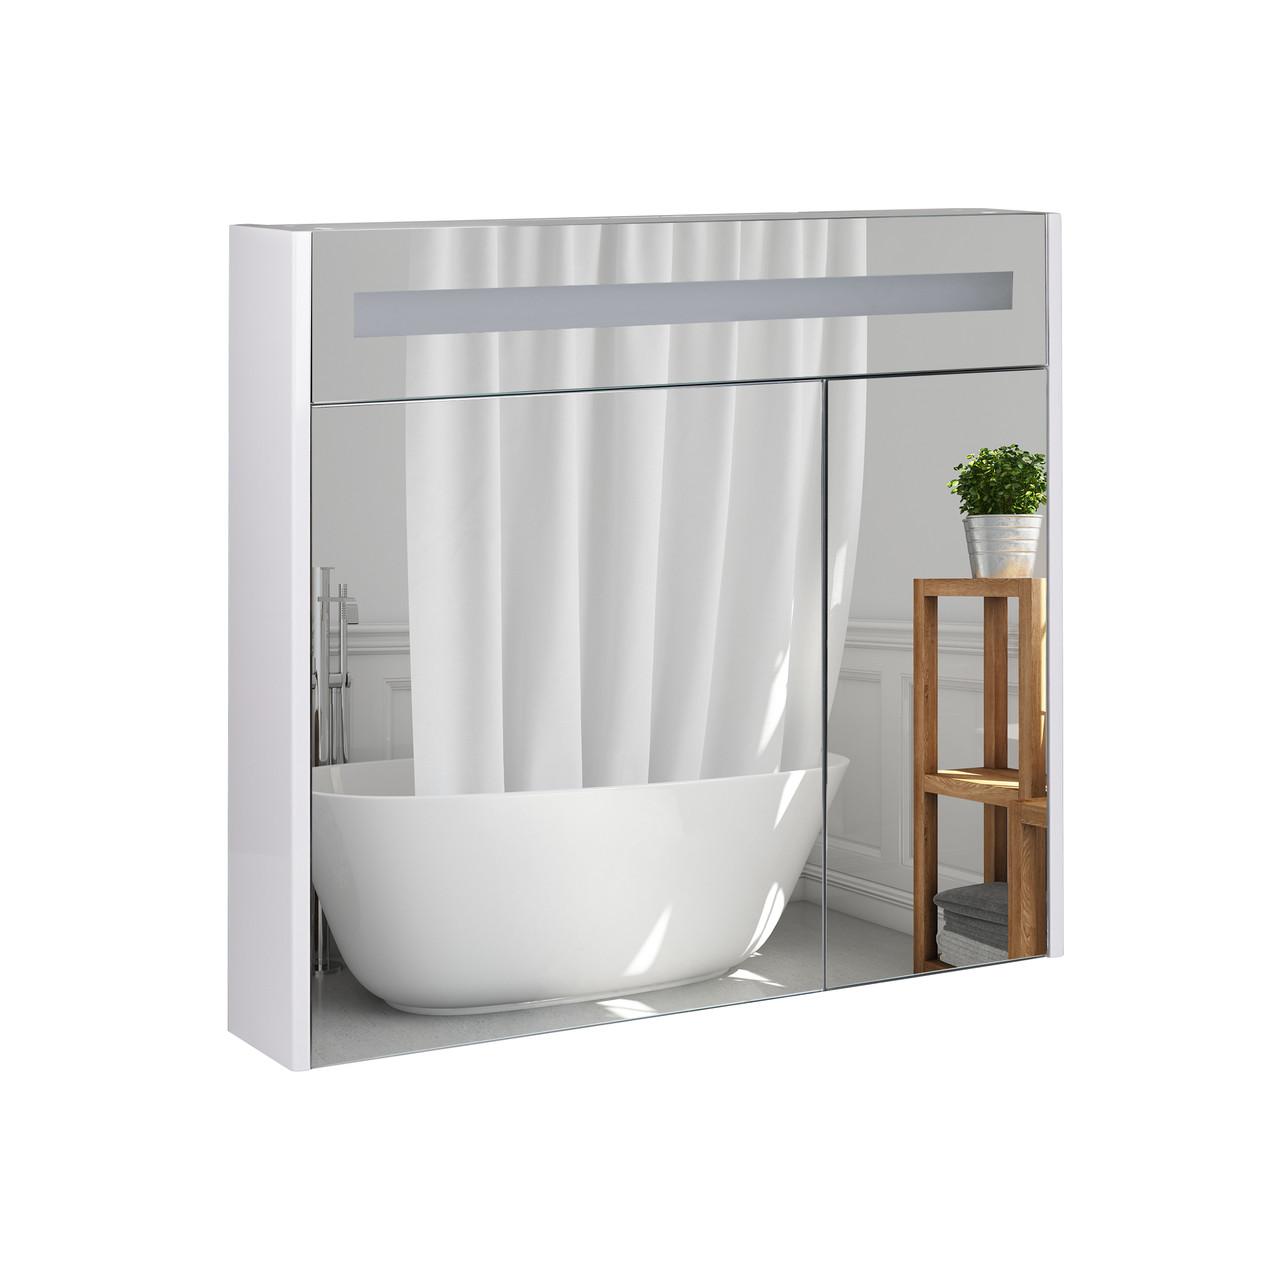 Зеркальный шкаф подвесной Qtap Robin 800х730х145 White с LED-подсветкой QT1377ZP8001W